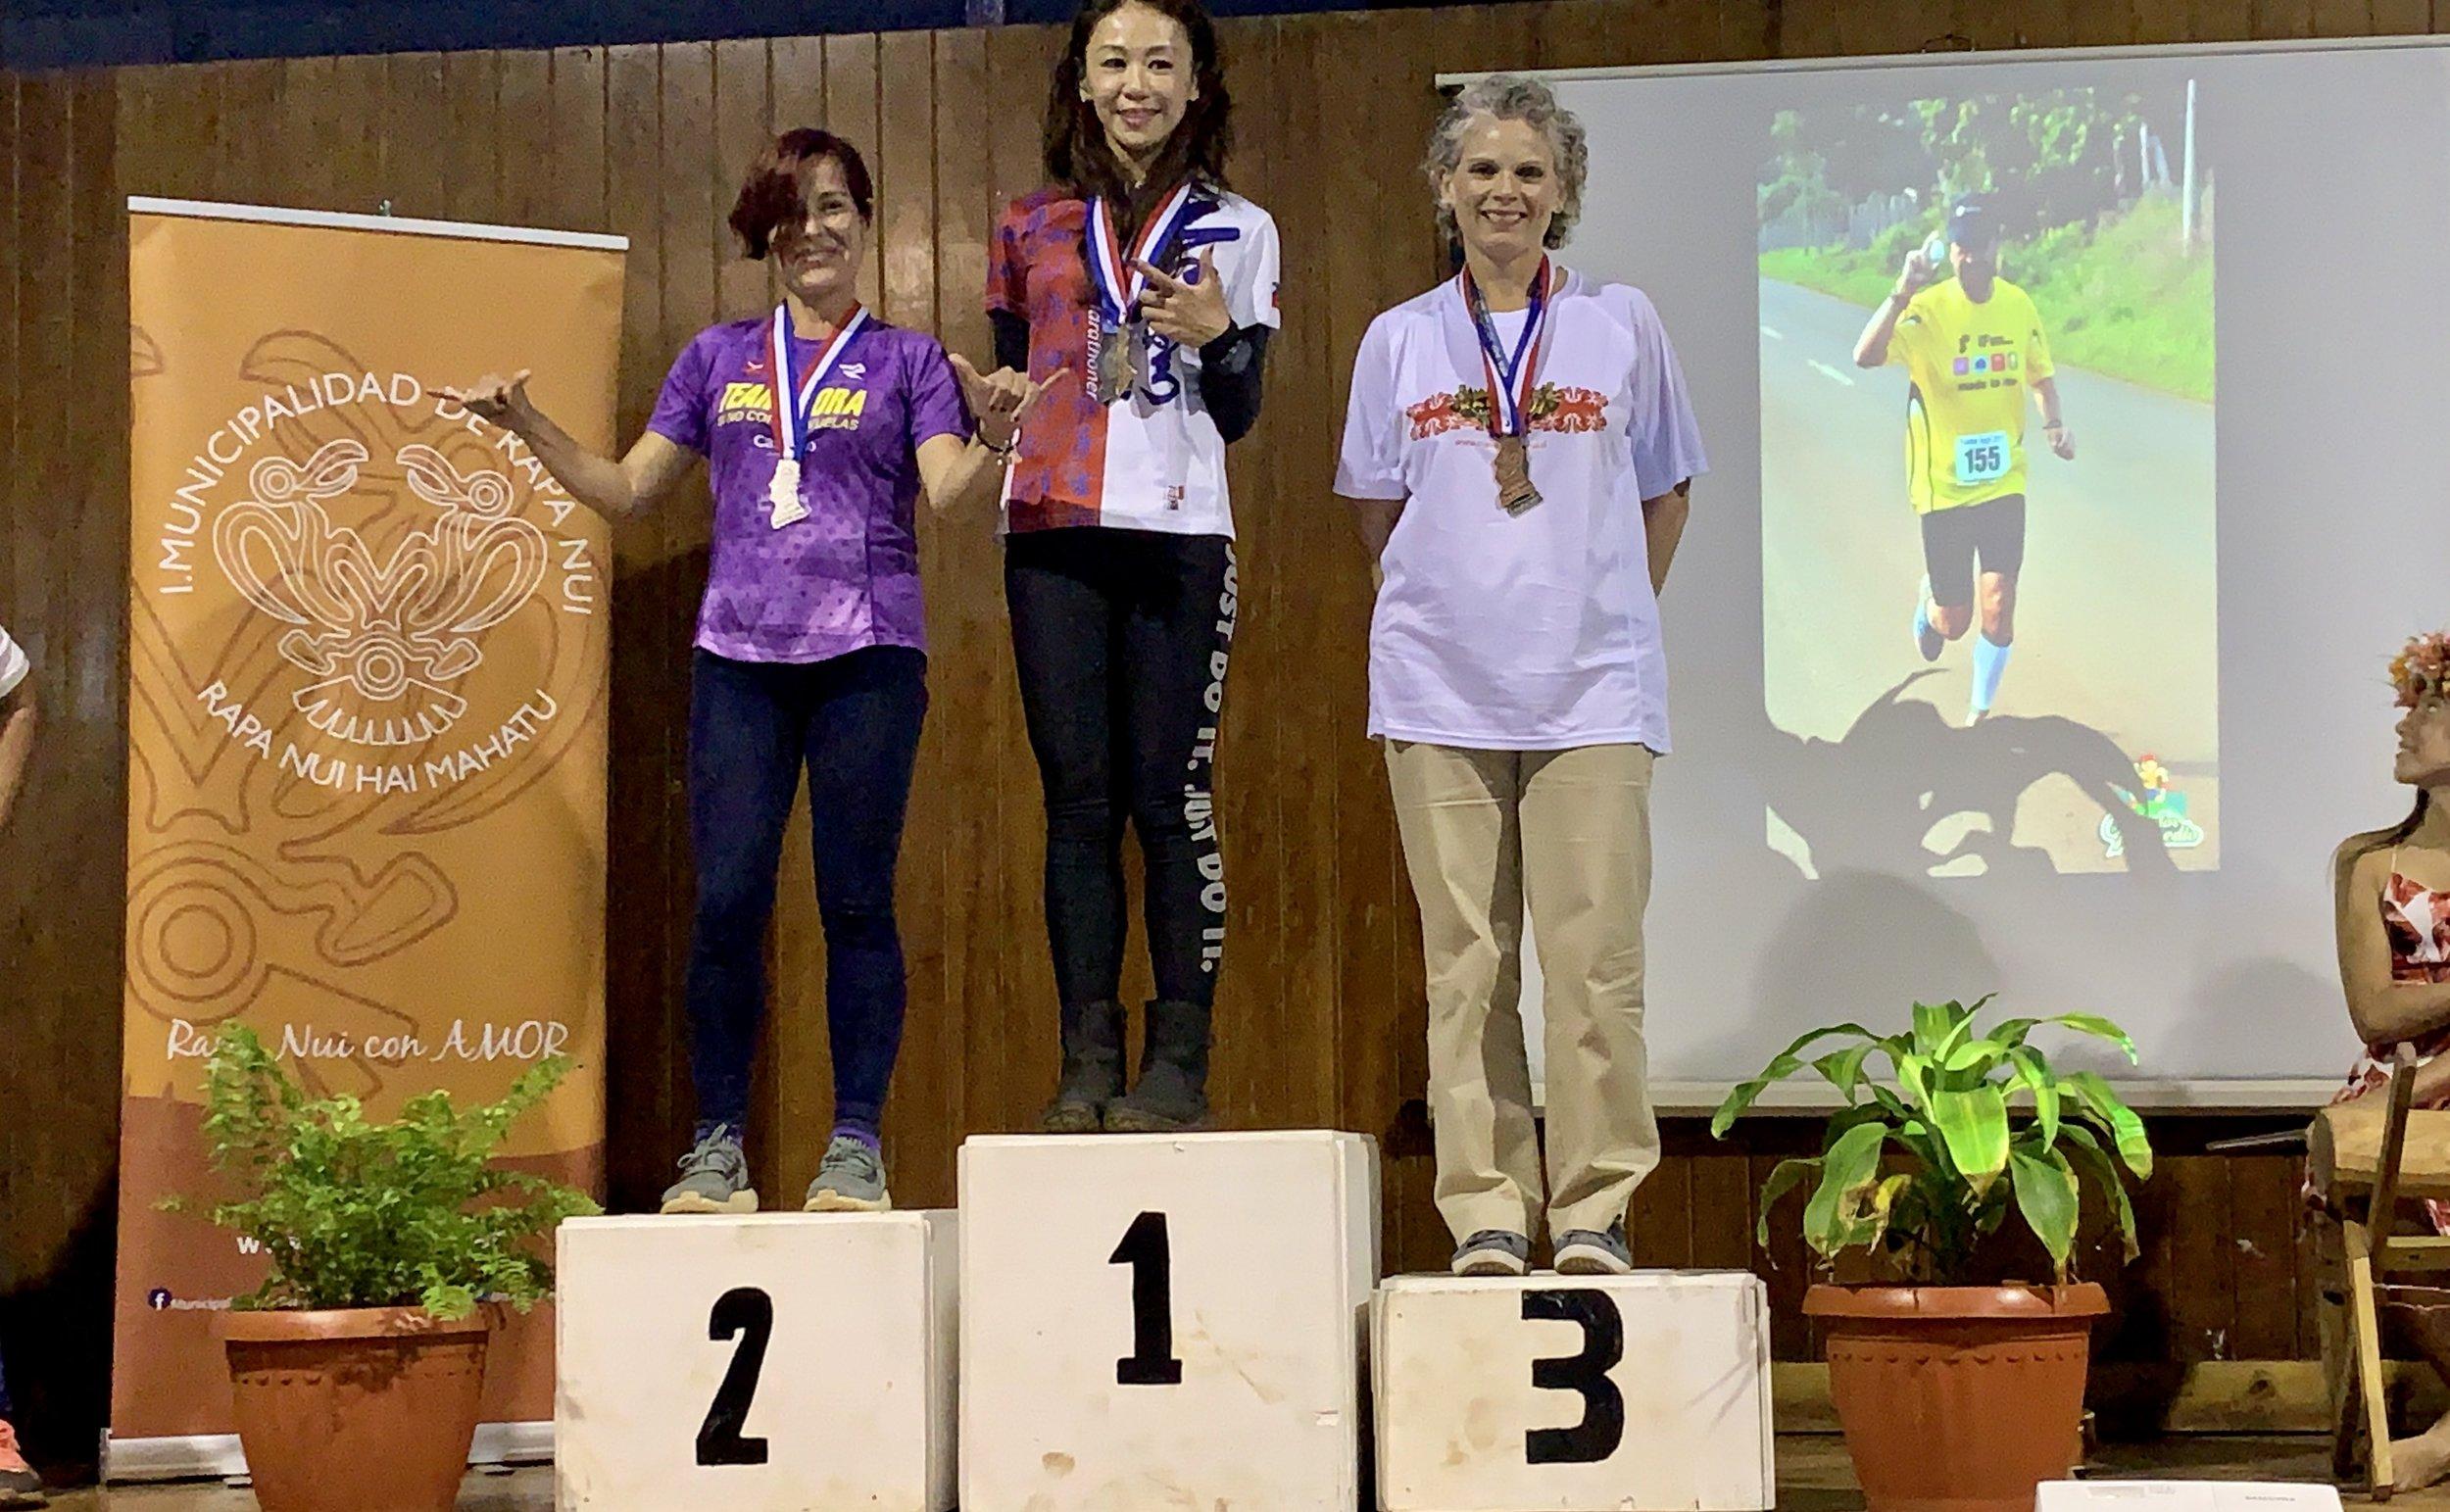 podium 3rd place